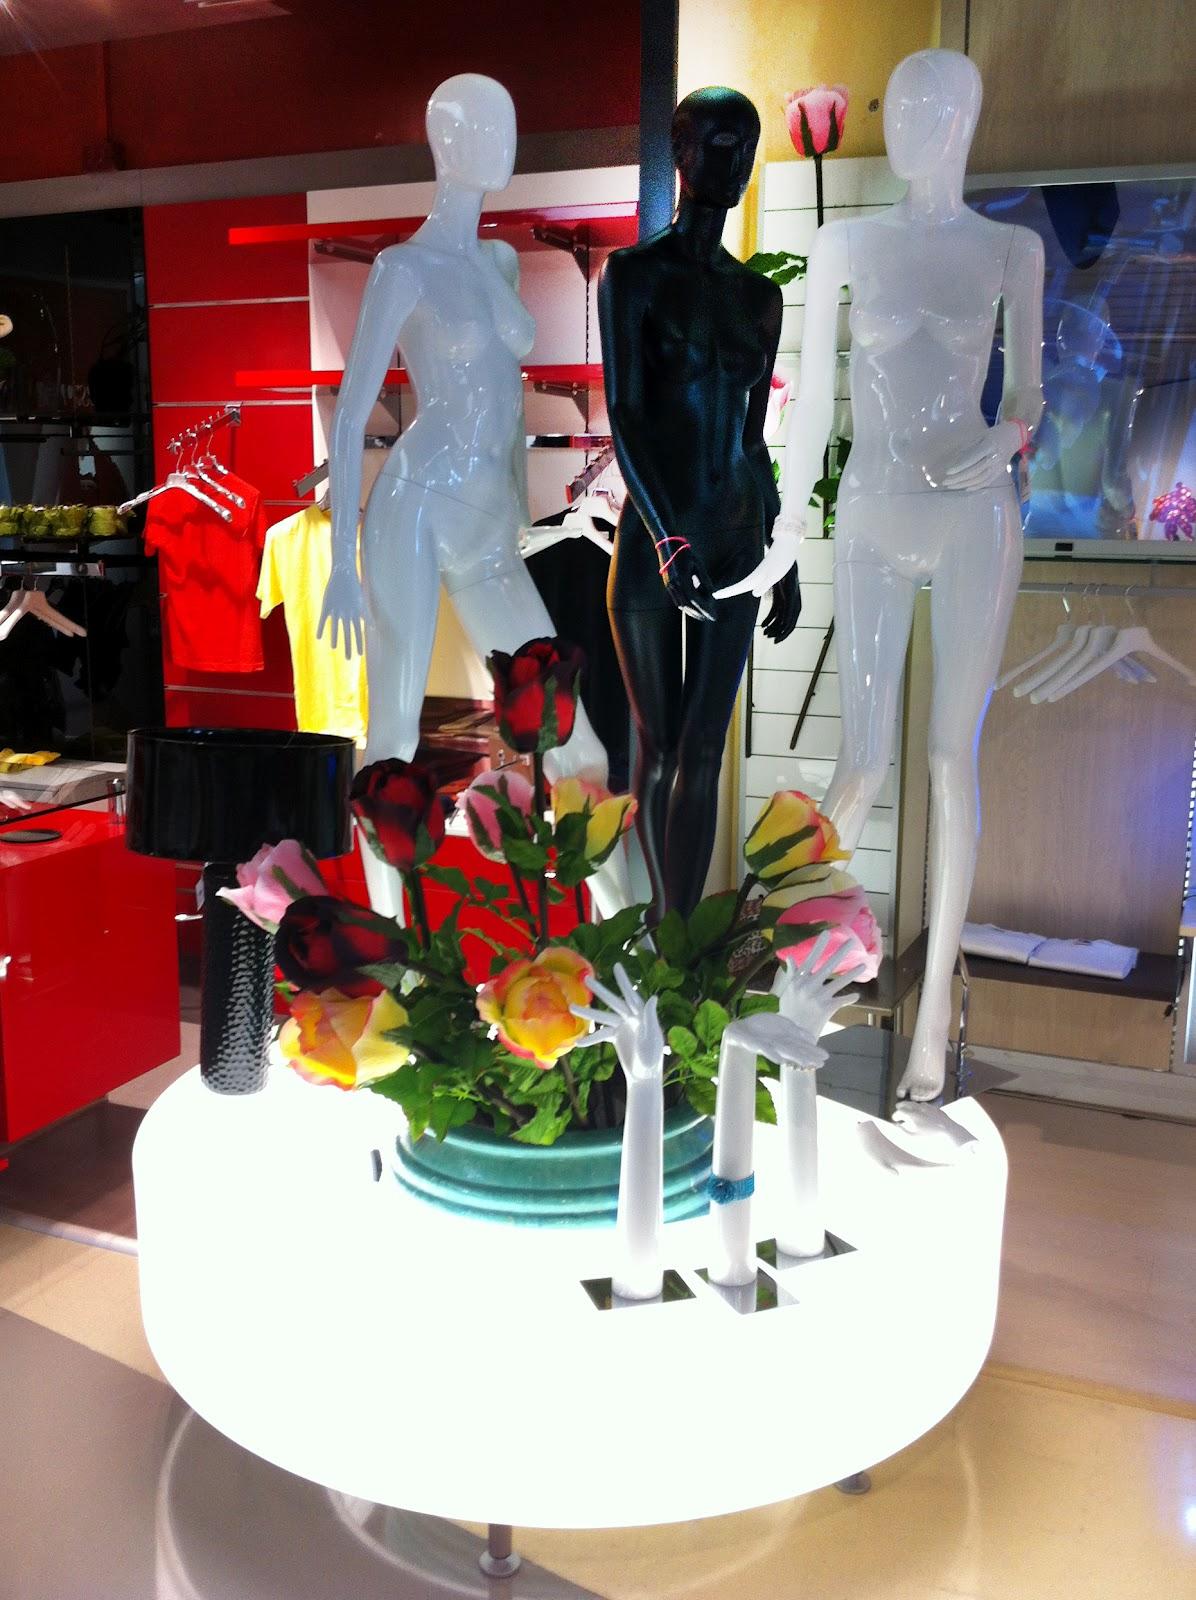 Intersystem arredamento negozi vetrine showroom - Idee per vetrine primaverili ...